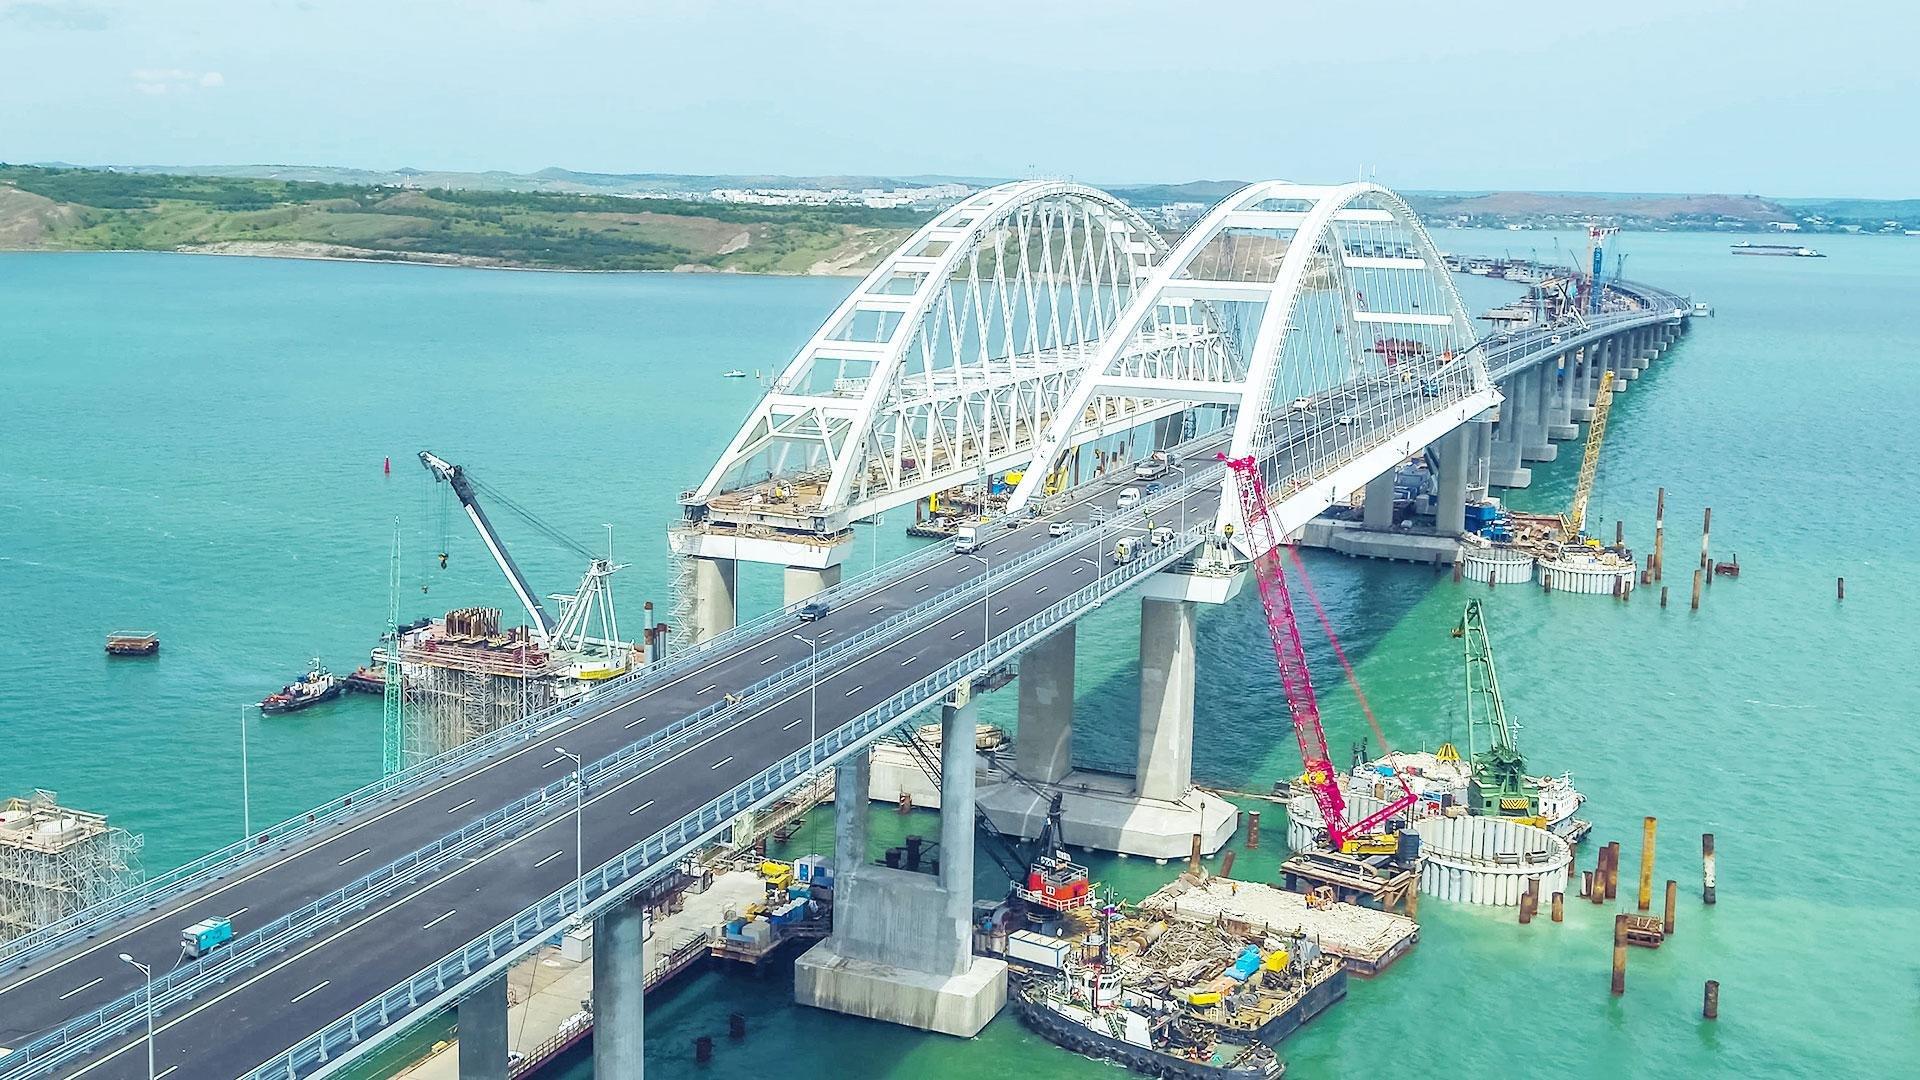 Мост через томь в кемерово фото